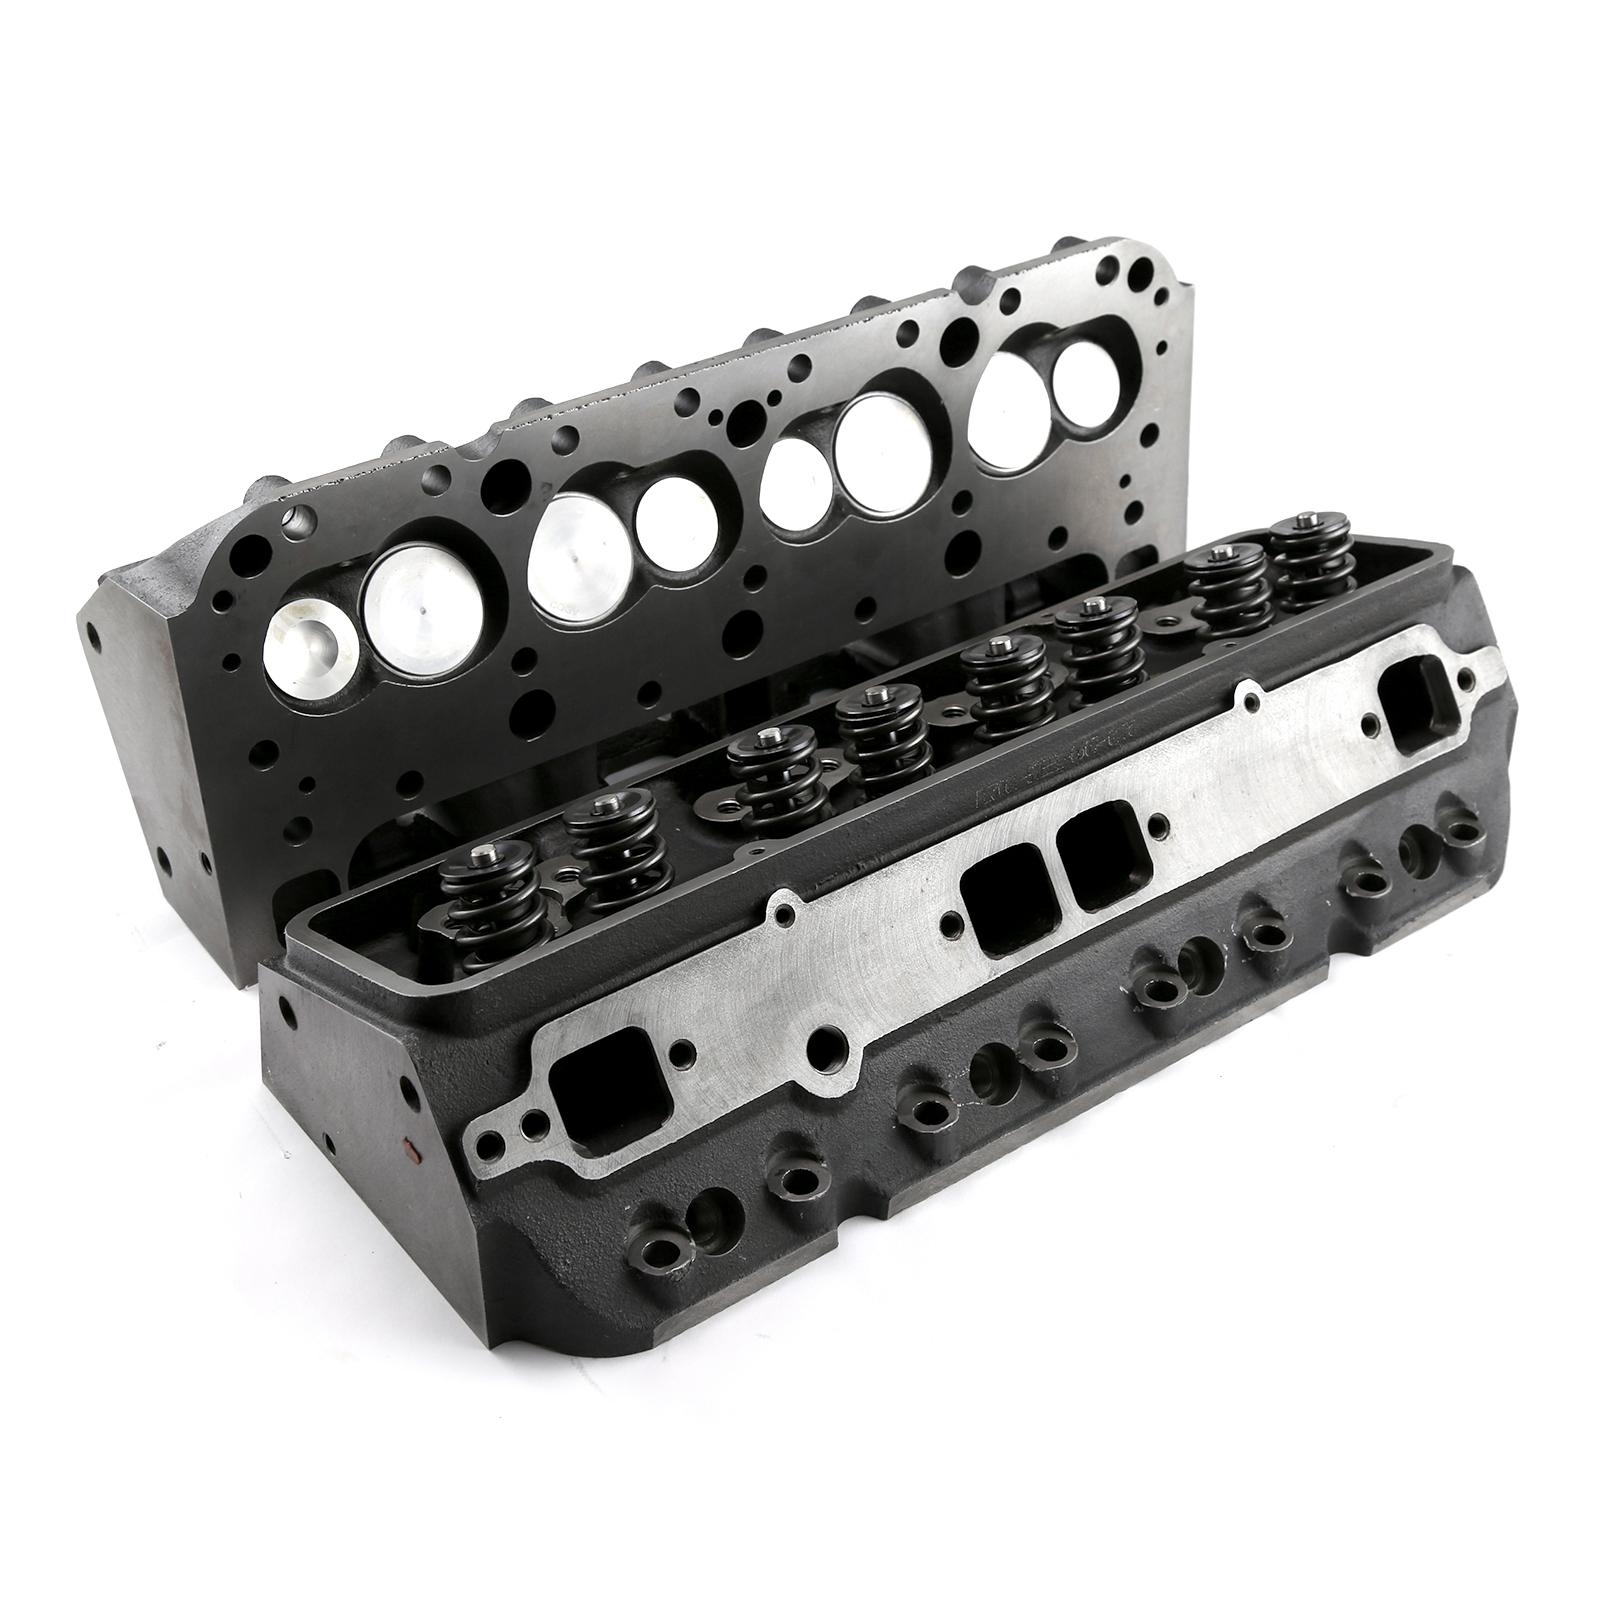 Speedmaster® PCE281.2158 Chevy SBC 350 175cc 59cc Straight Hydraulic Flat Assembled Cylinder Heads